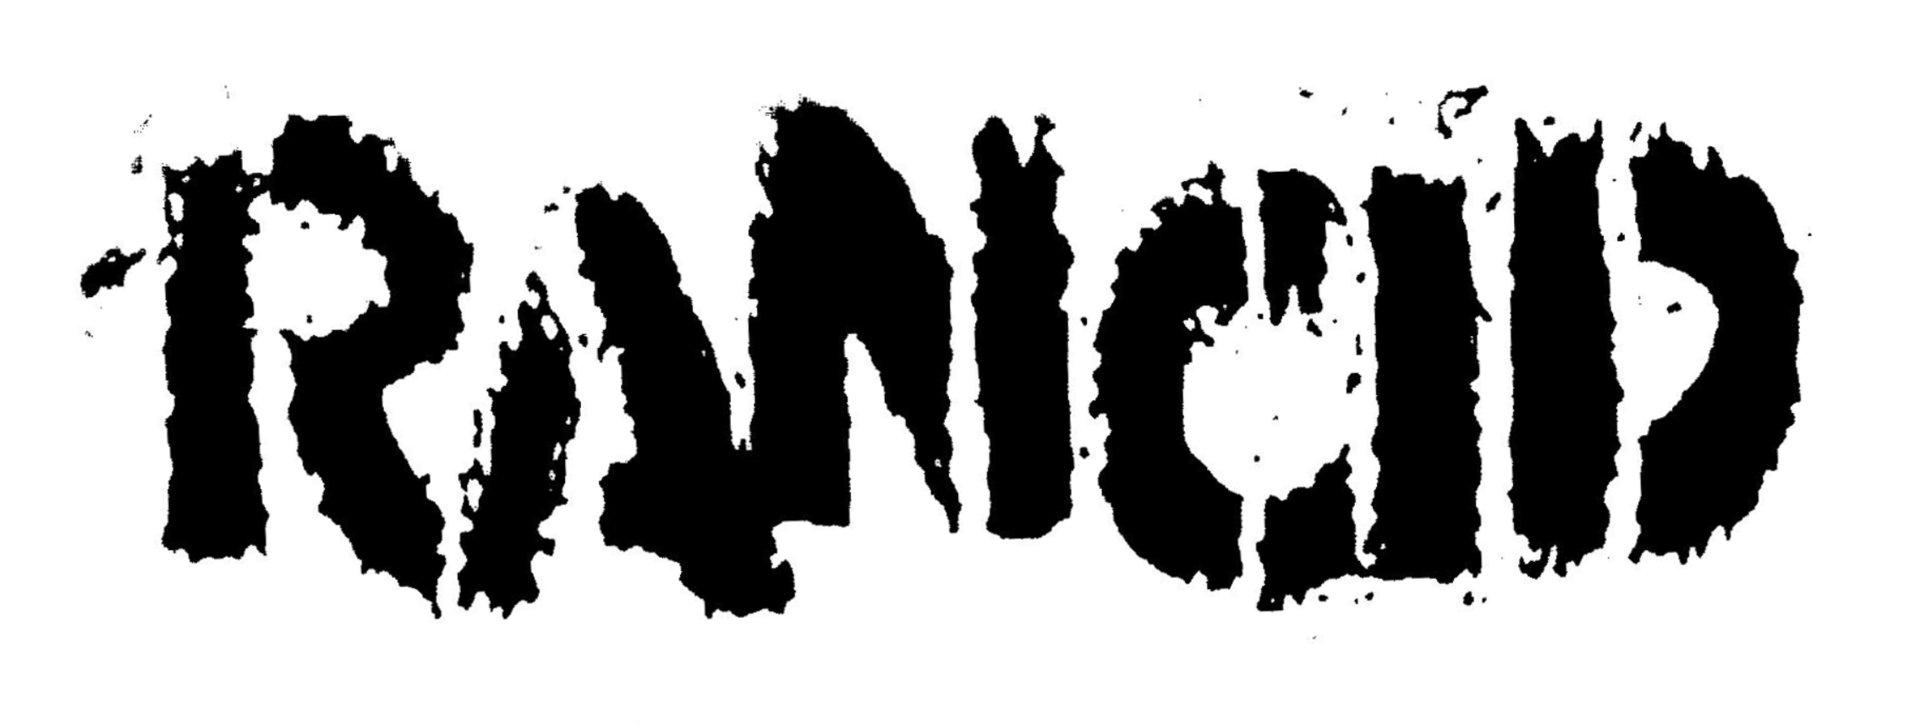 rancid logo patch laketownrecords label amp onlineshop